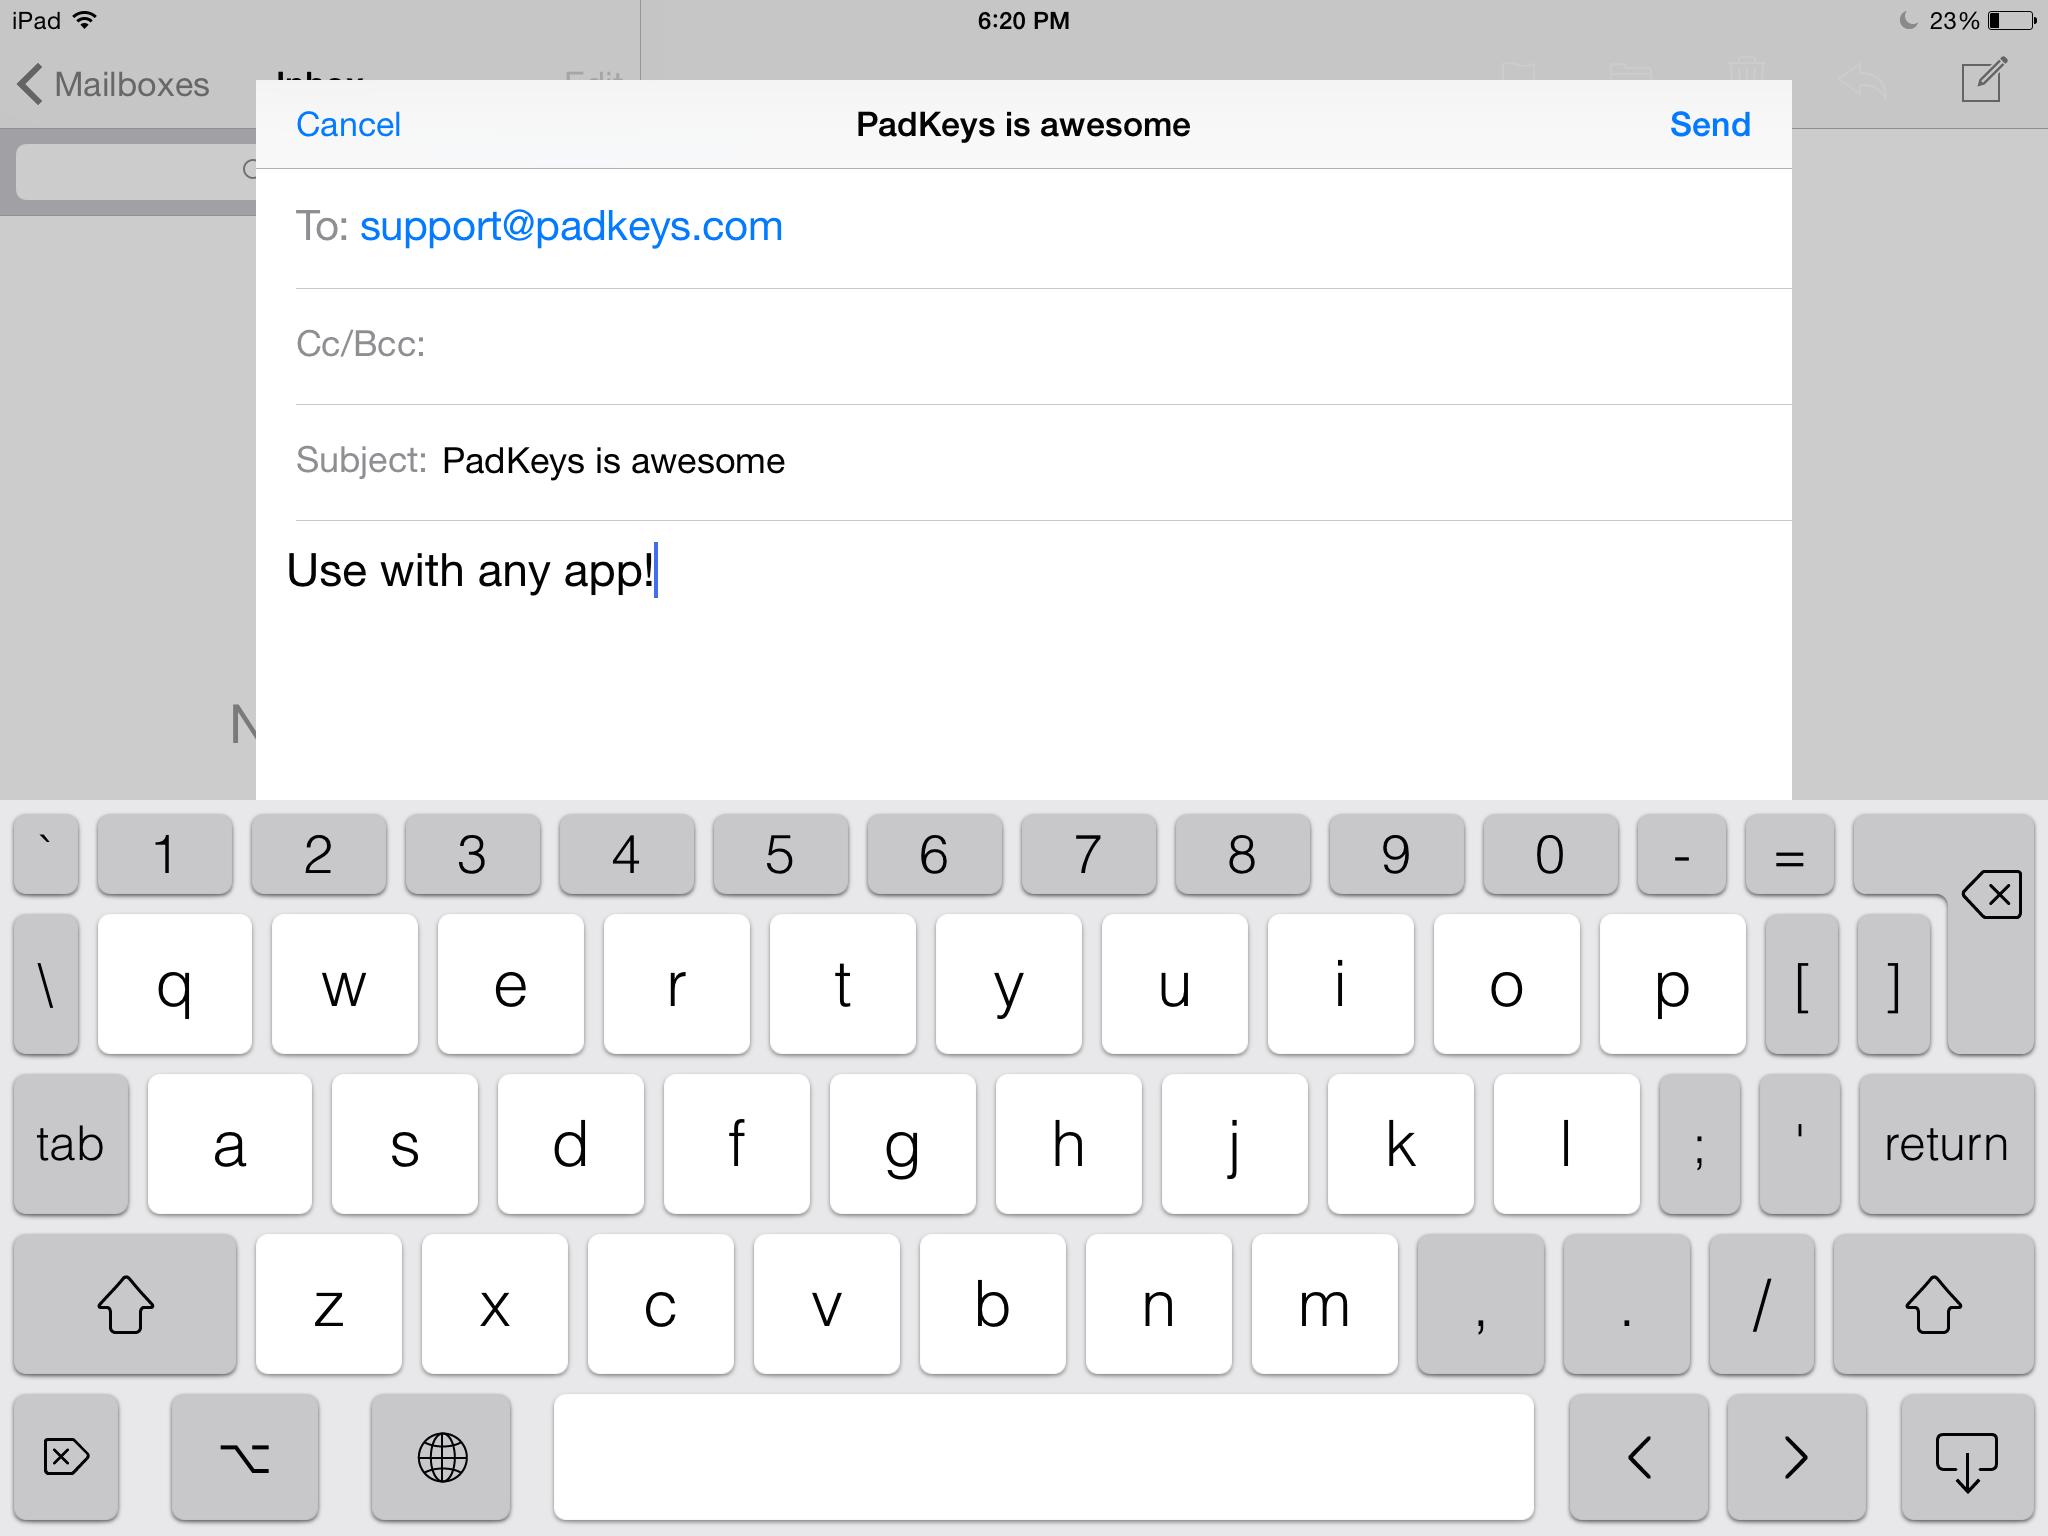 PadKeys: iOS custom keyboard designed for iPad Image